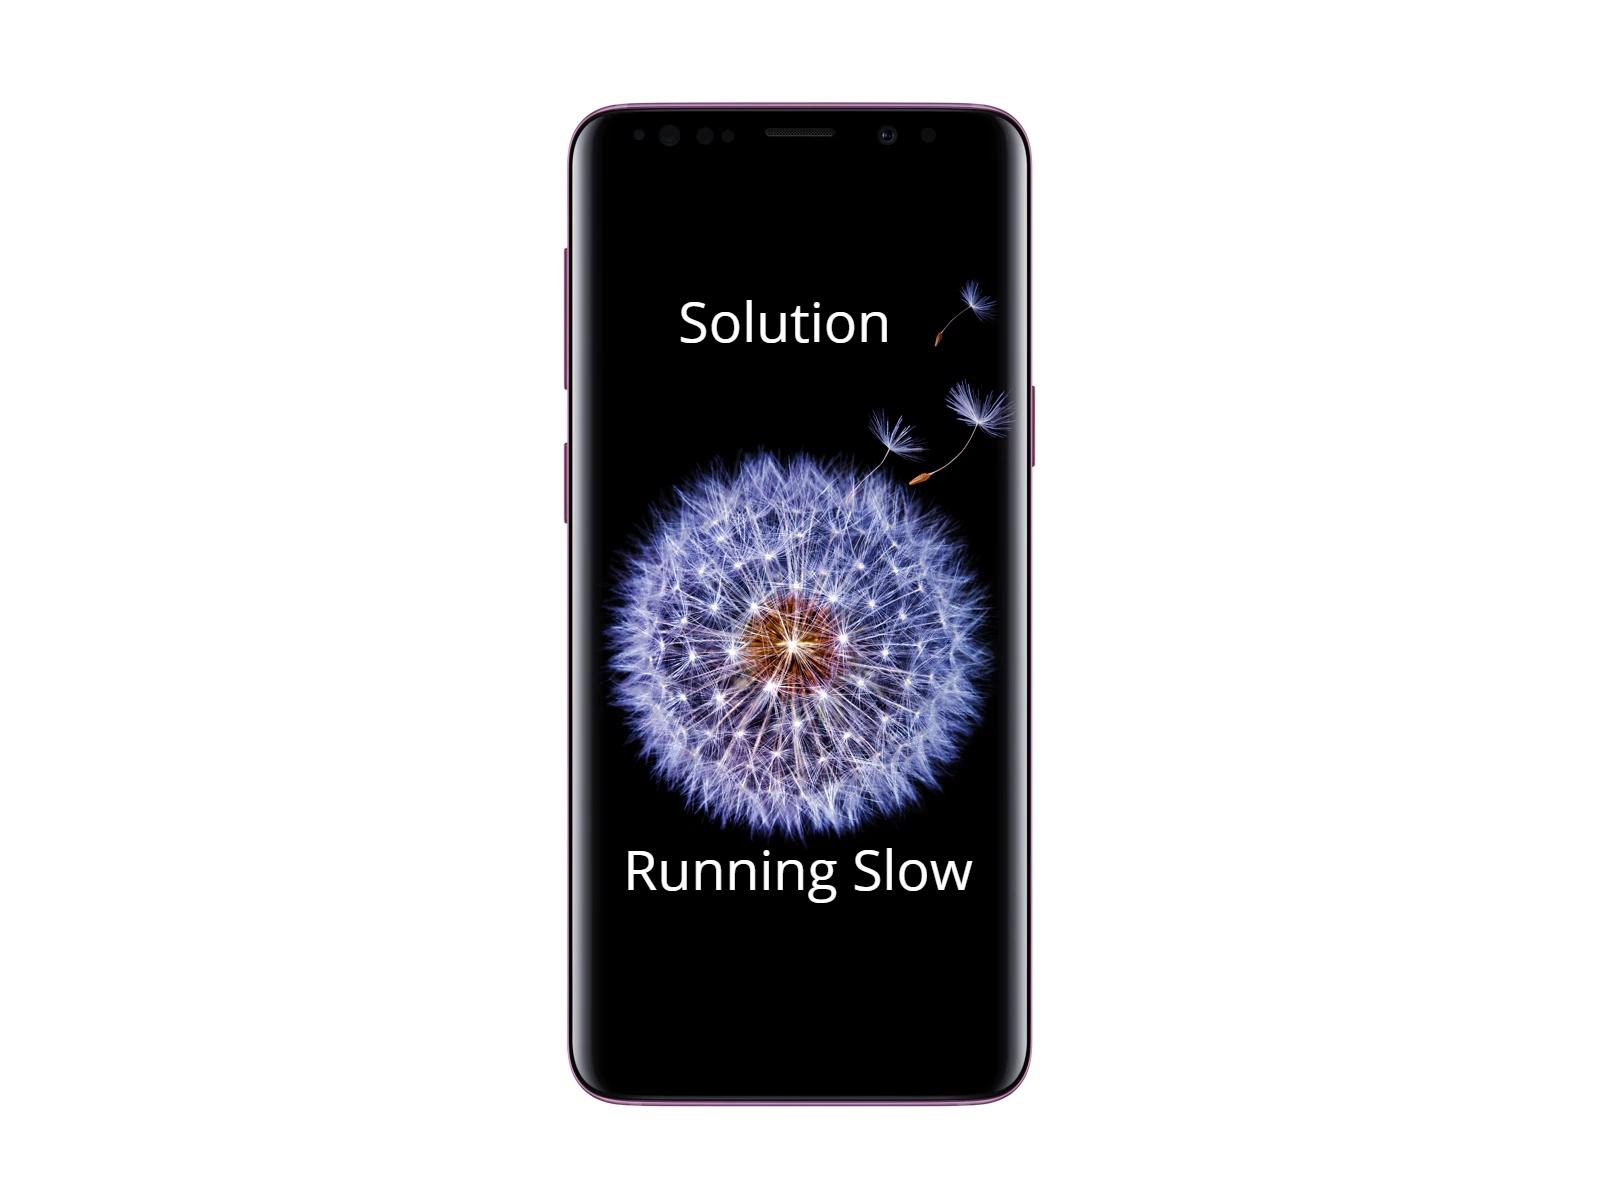 Samsung Galaxy S9 Running Slow